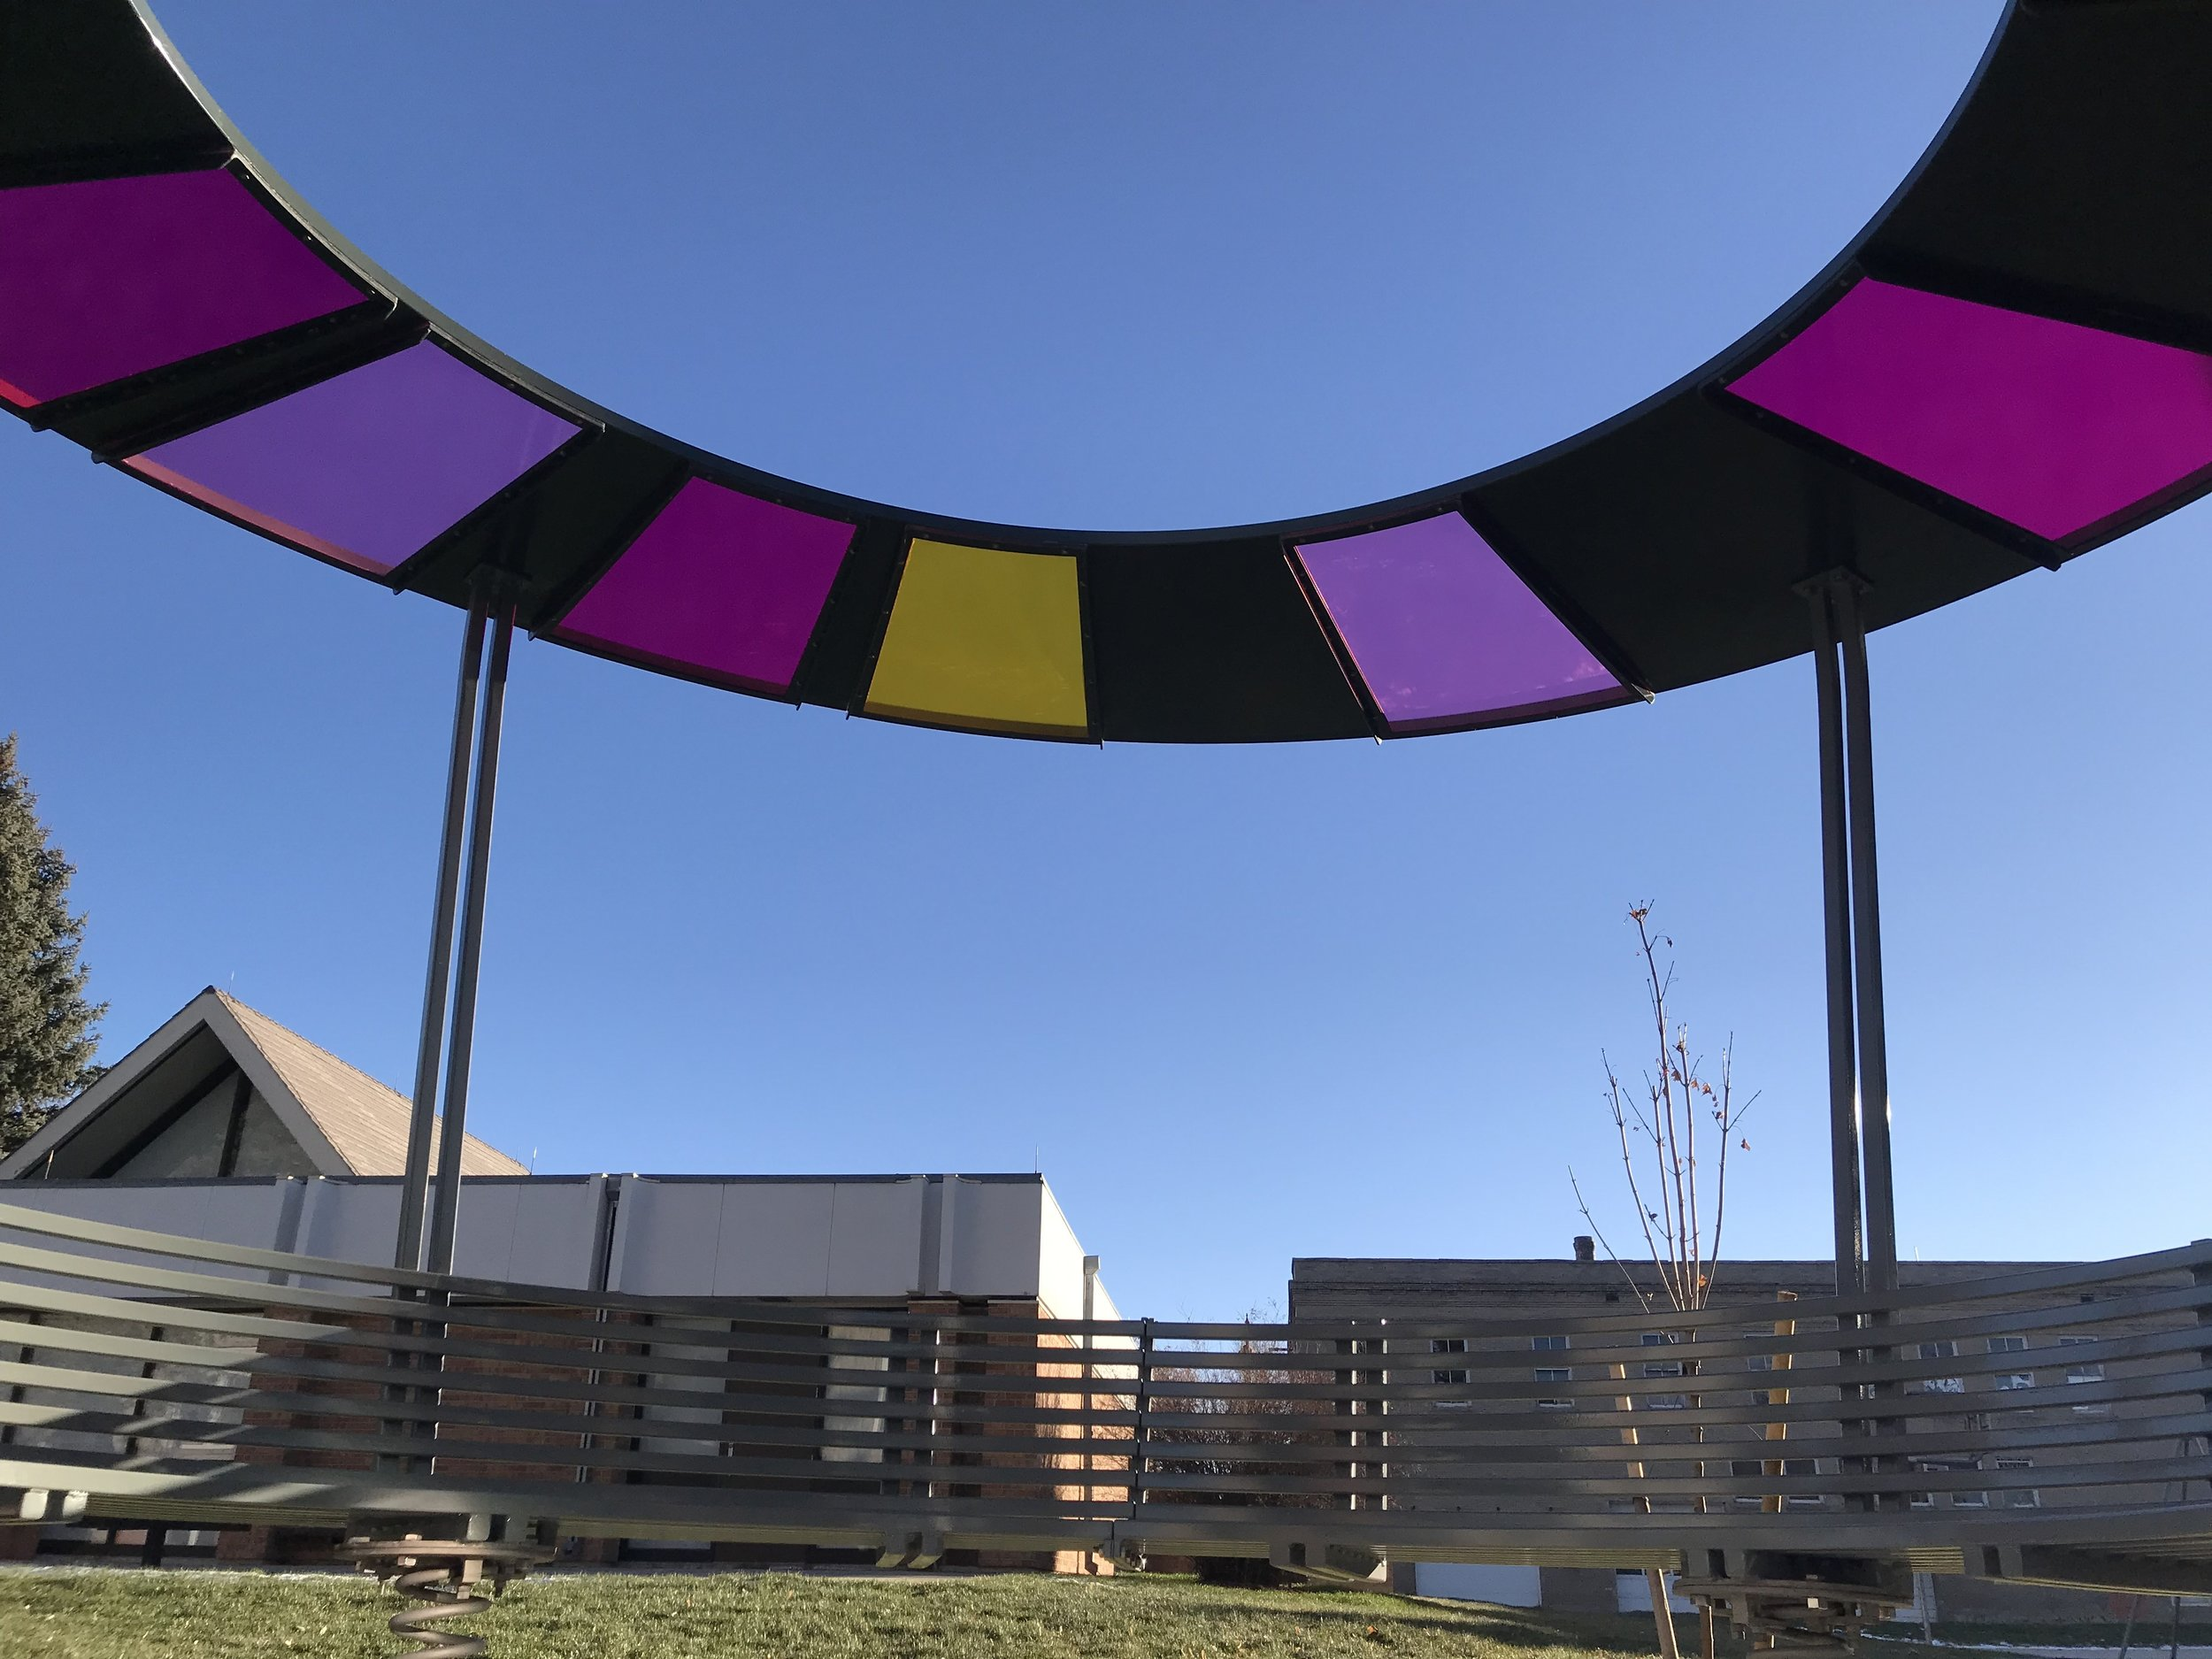 Matthew Geller_Springs_Colorado Springs_Public Art Services_J Grant Projects_18.JPG